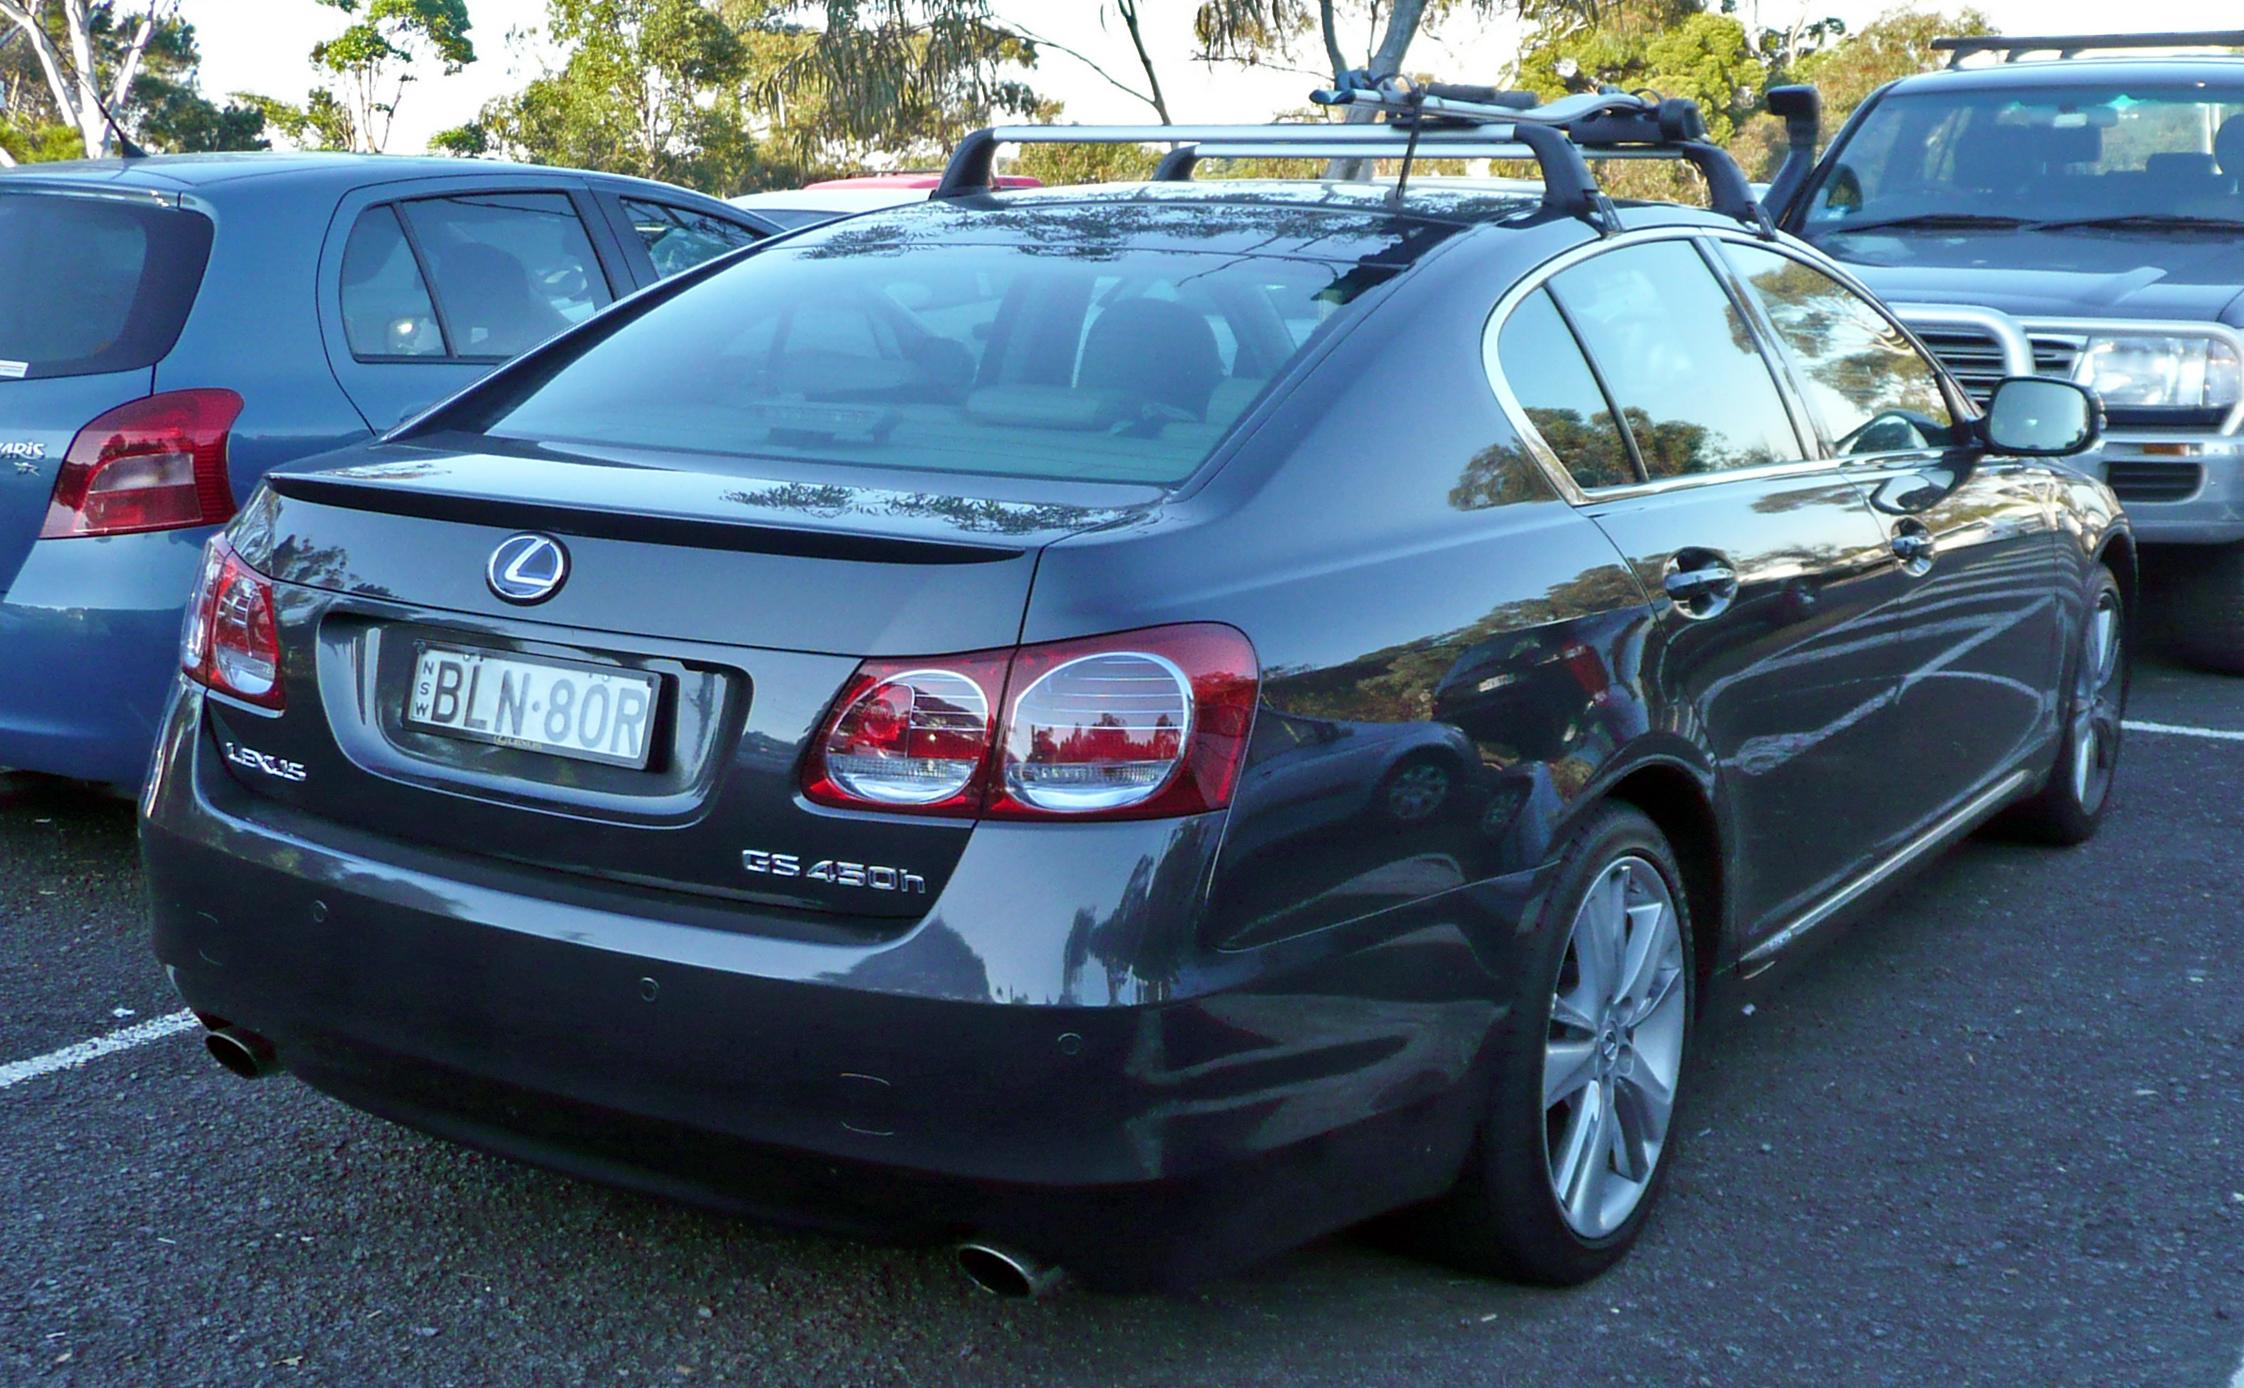 Lexus Is 450 >> 2010 LEXUS GS 450H - Image #14